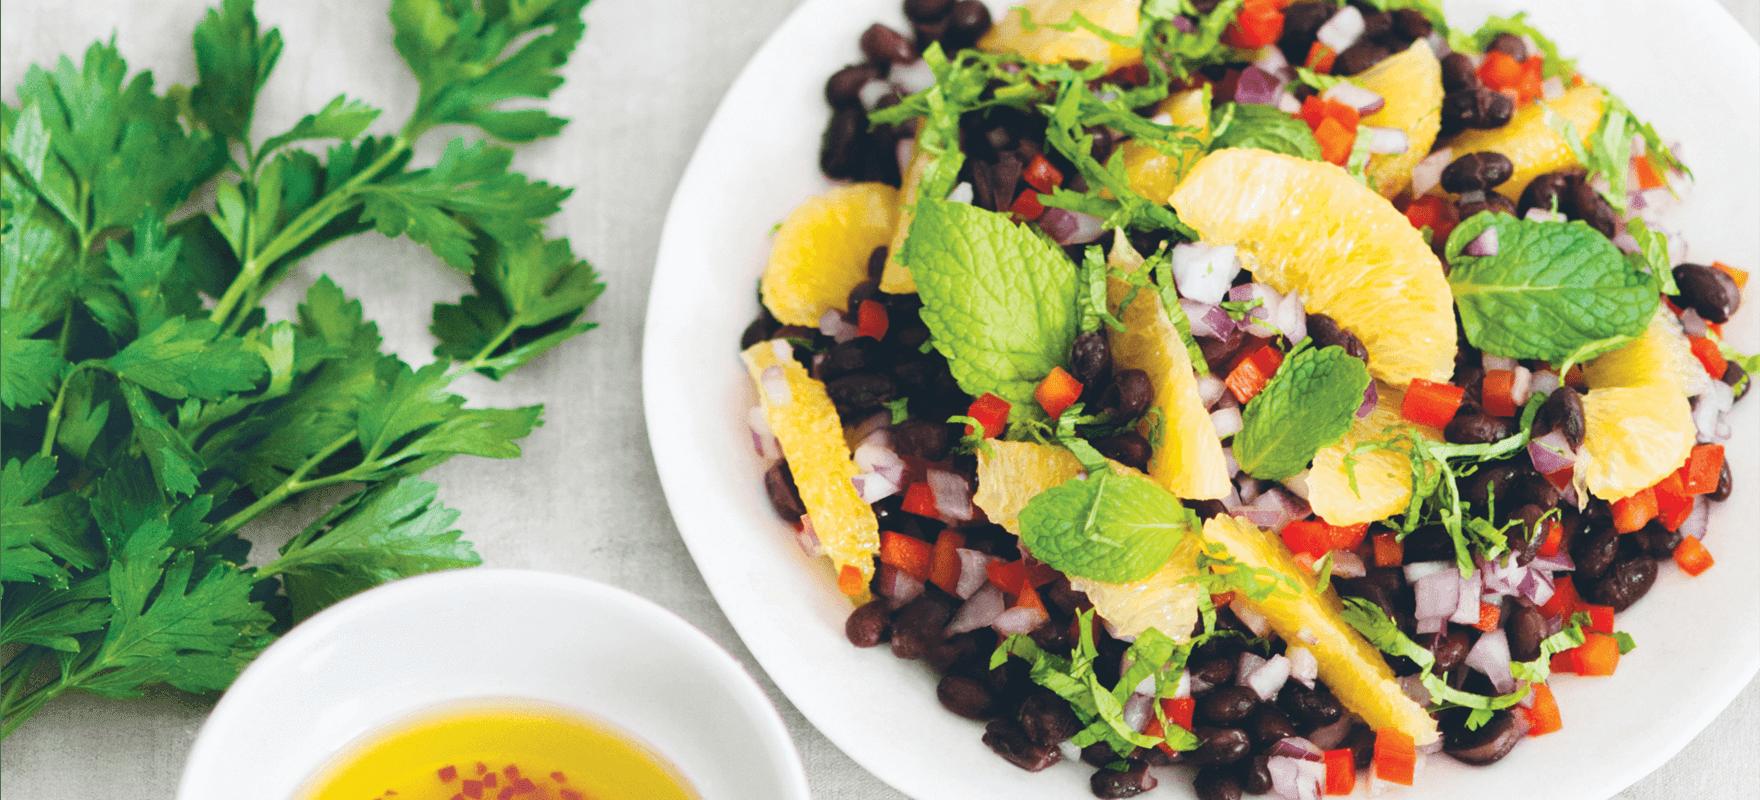 Black bean, orange, coriander and mint salad image 1